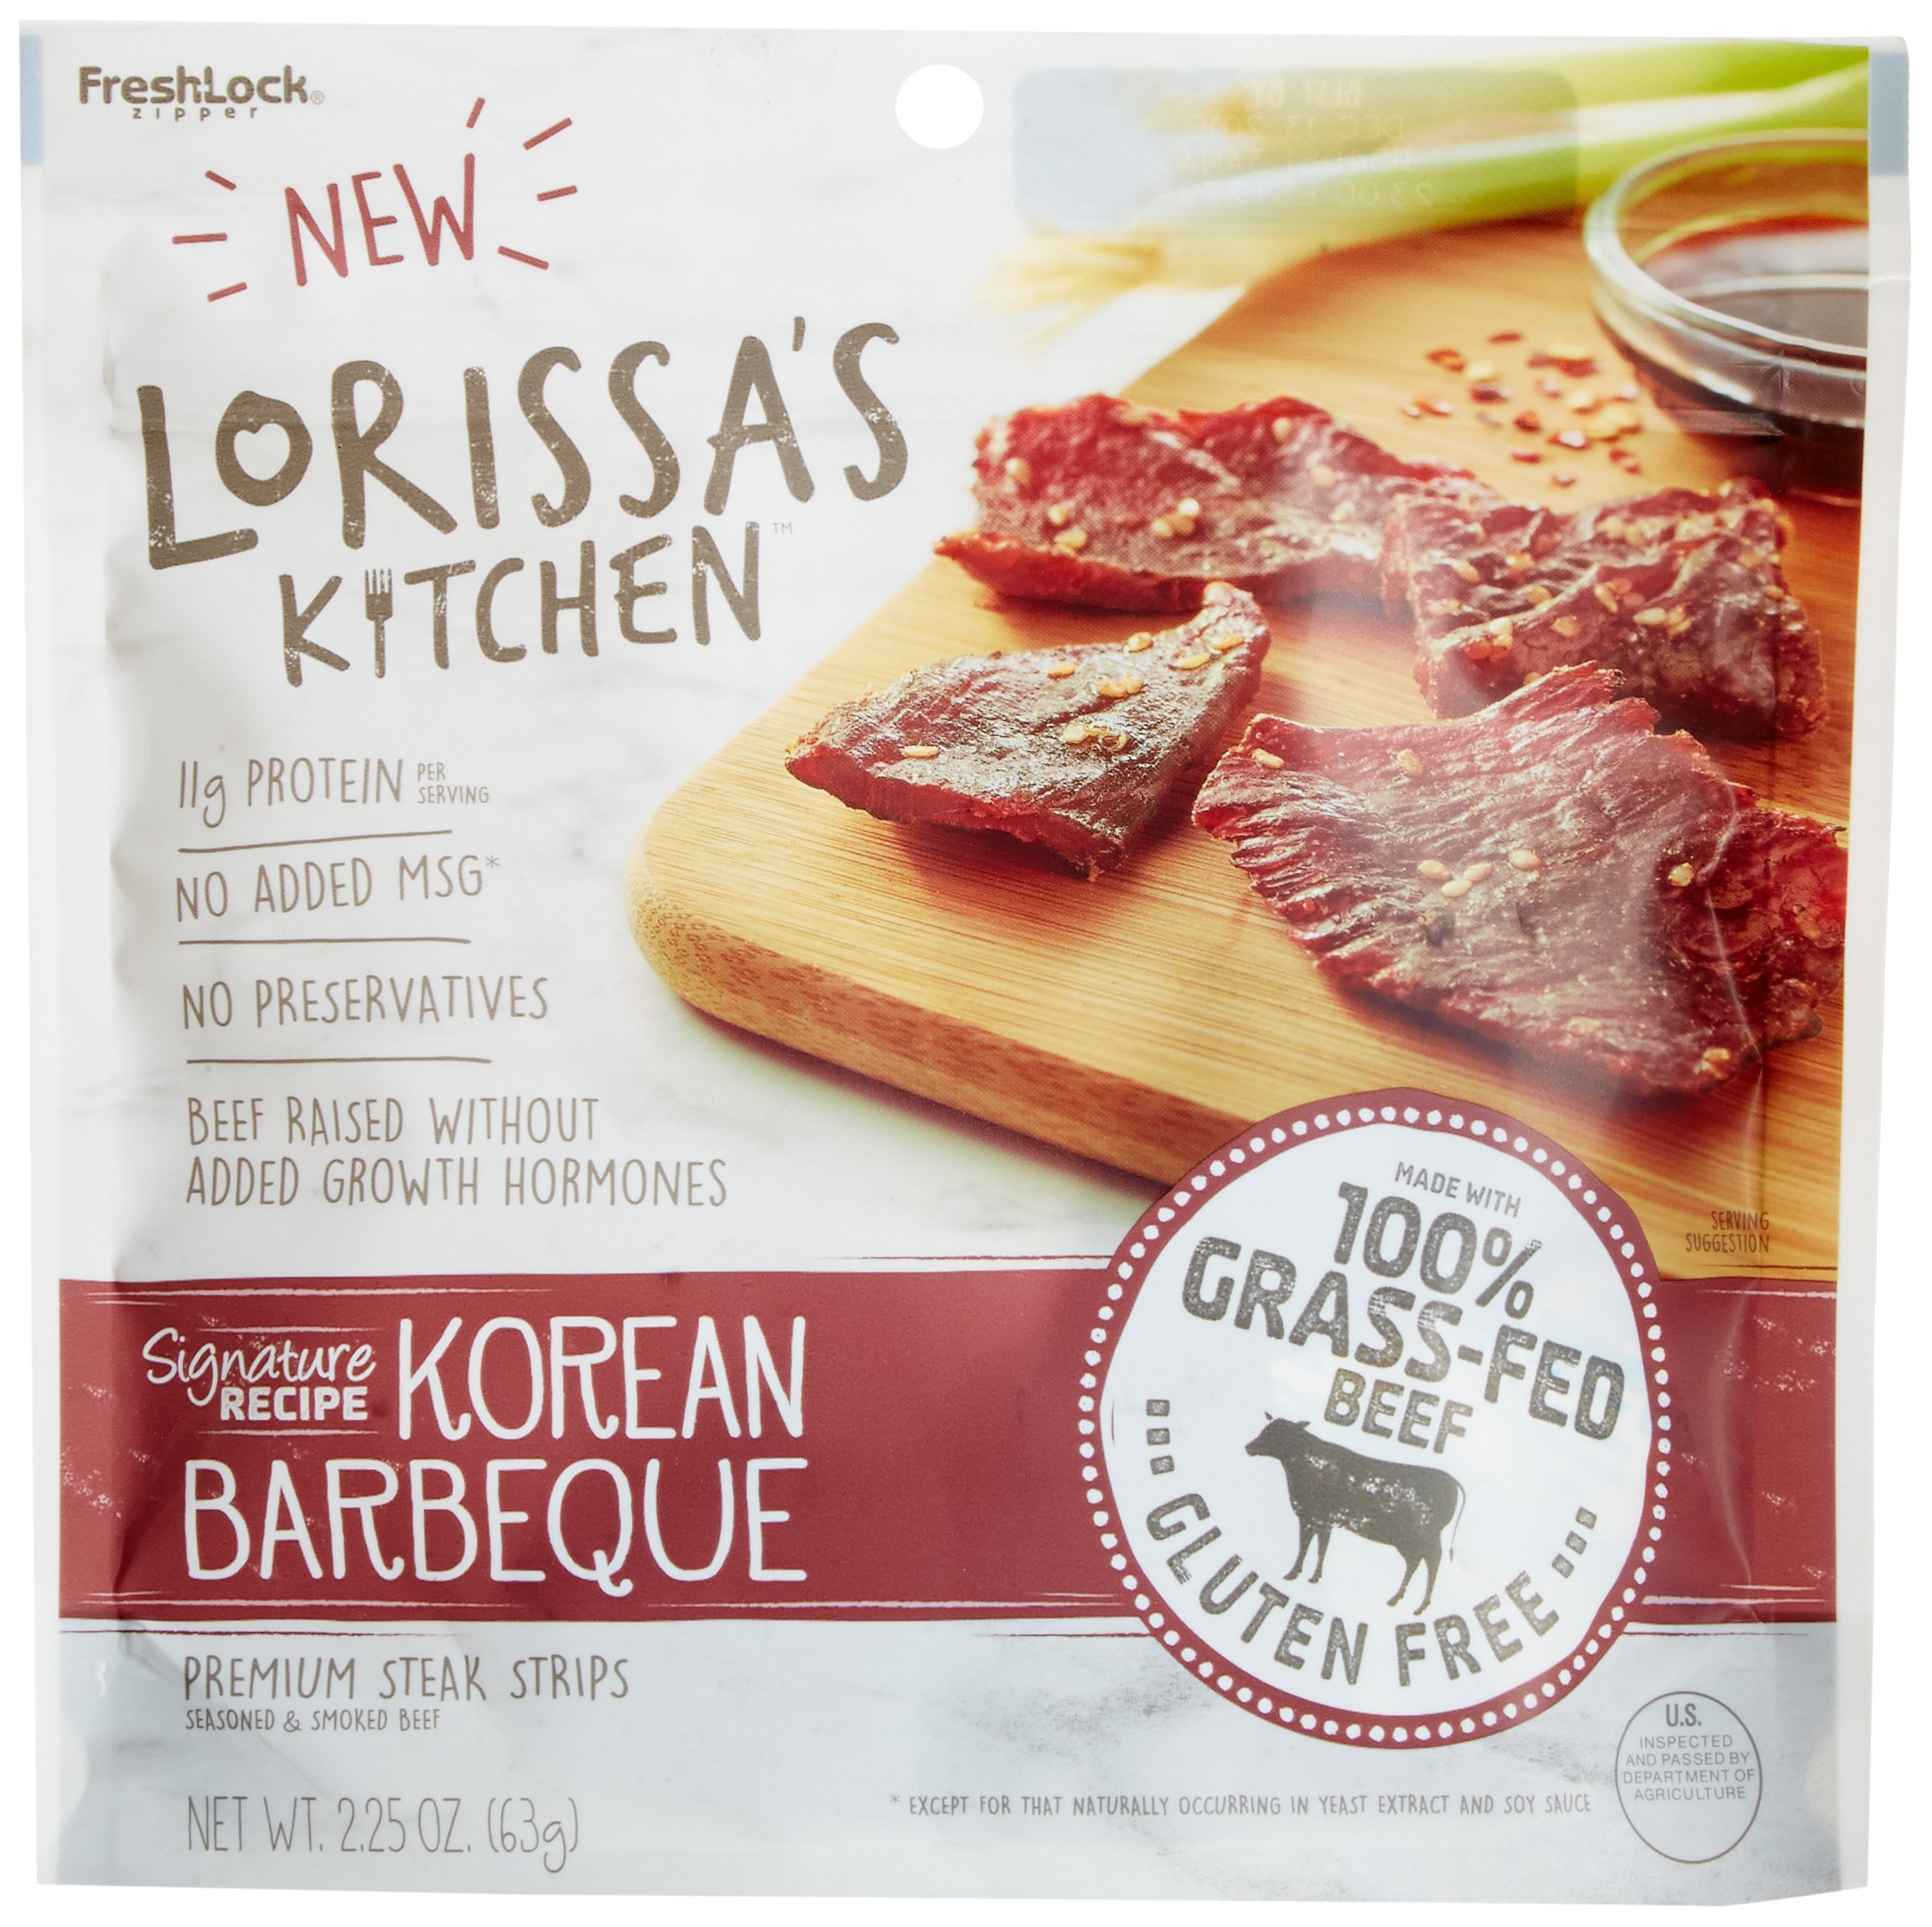 Lorissa's Kitchen Premium Steak Strips, Korean Barbeque, 2.25 Ounce (Pack of 4)